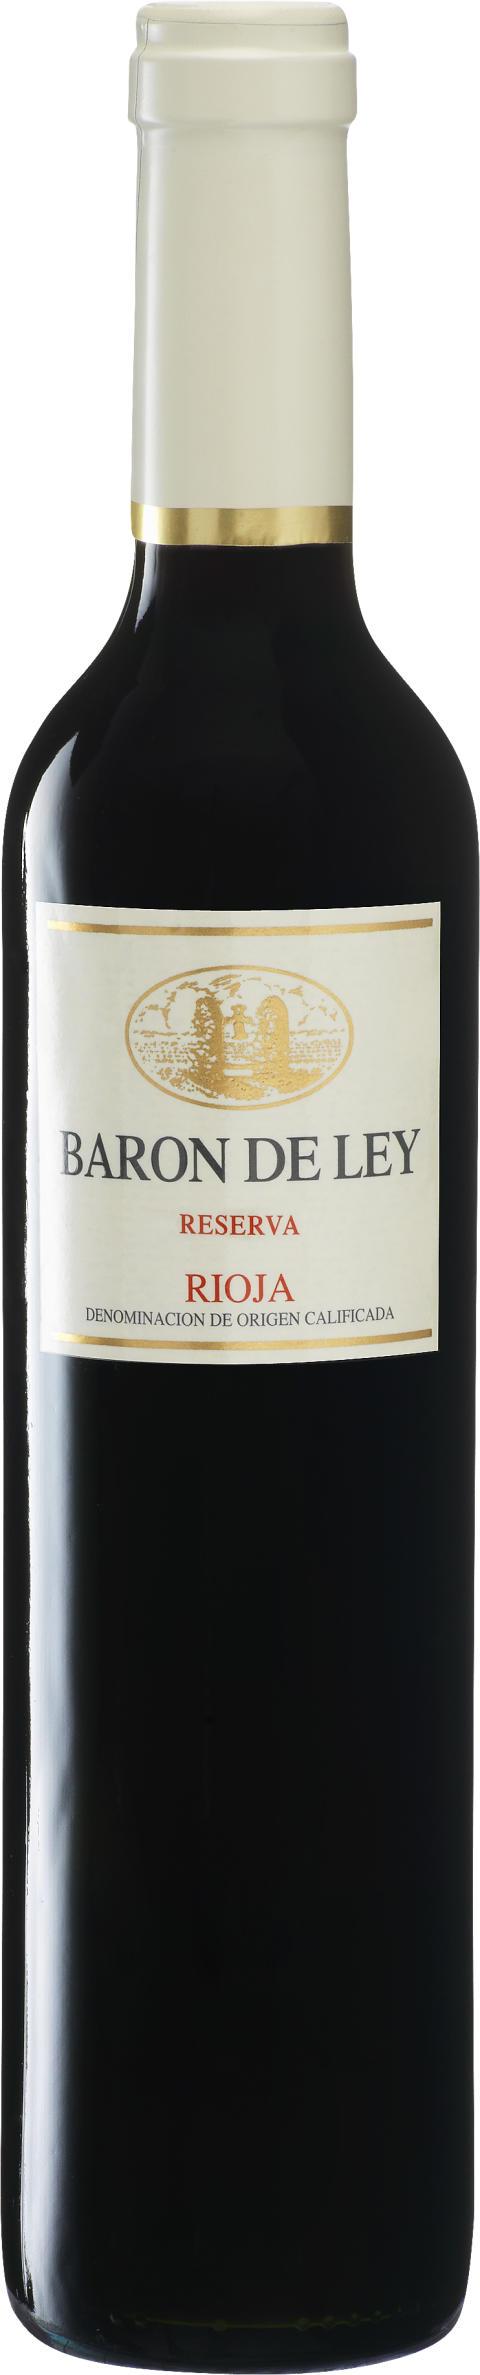 Baron de Ley Reserva 500ml